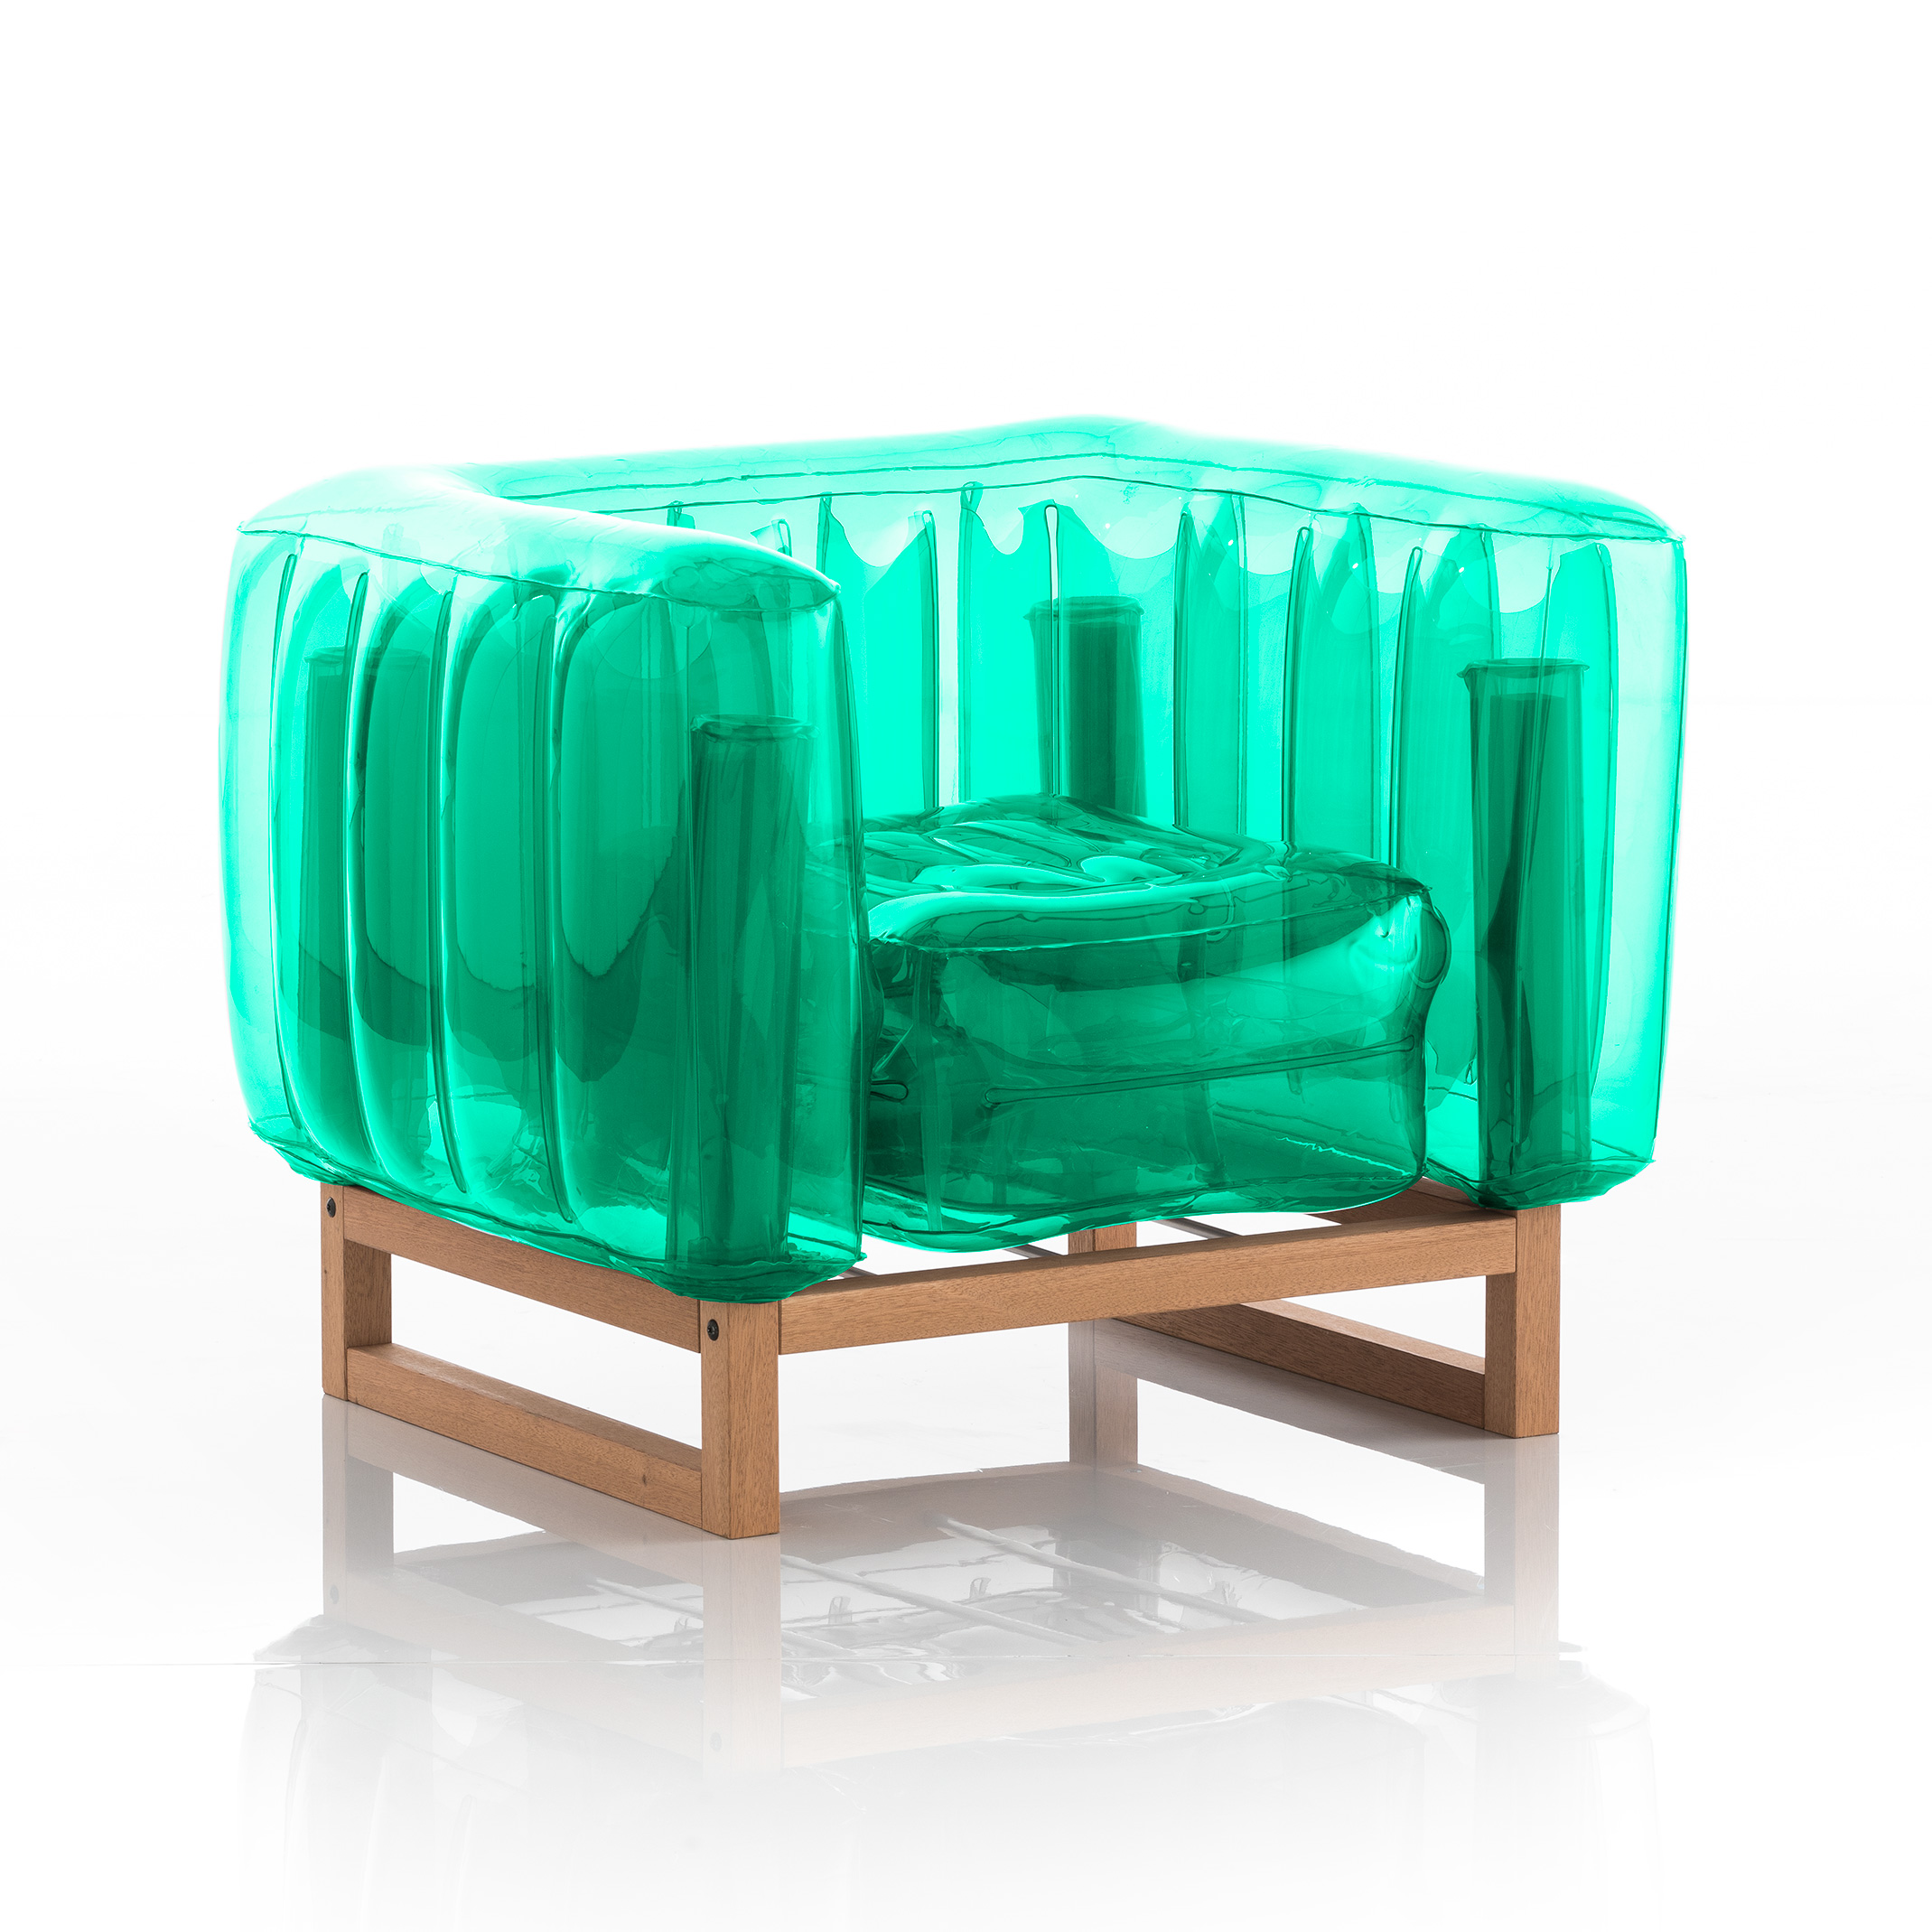 Fauteuil tpu vert cristal cadre en bois